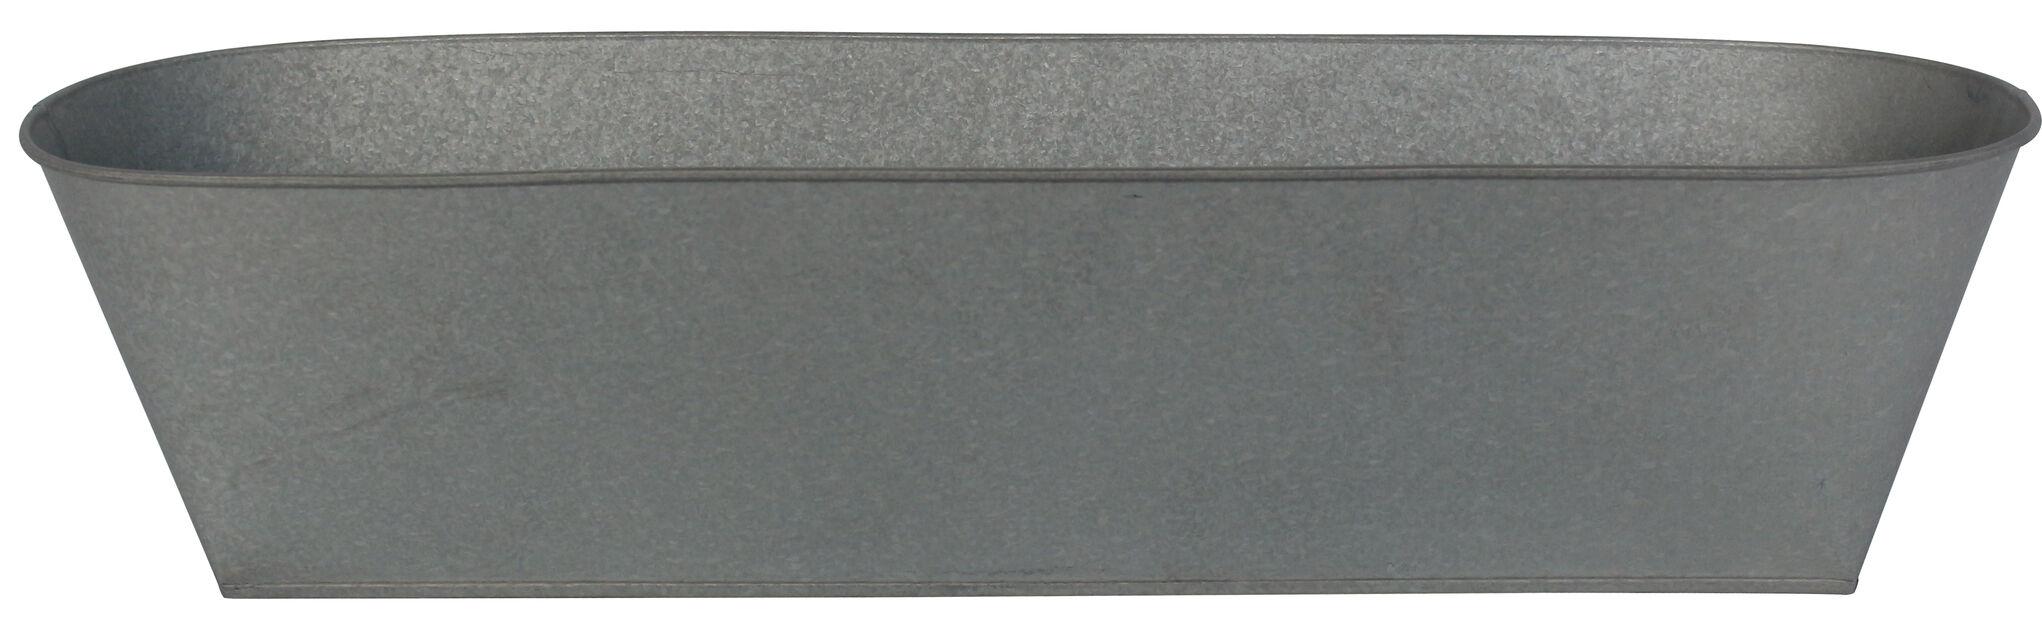 Parvekelaatikko Mario, Pituus 61 cm, Harmaa